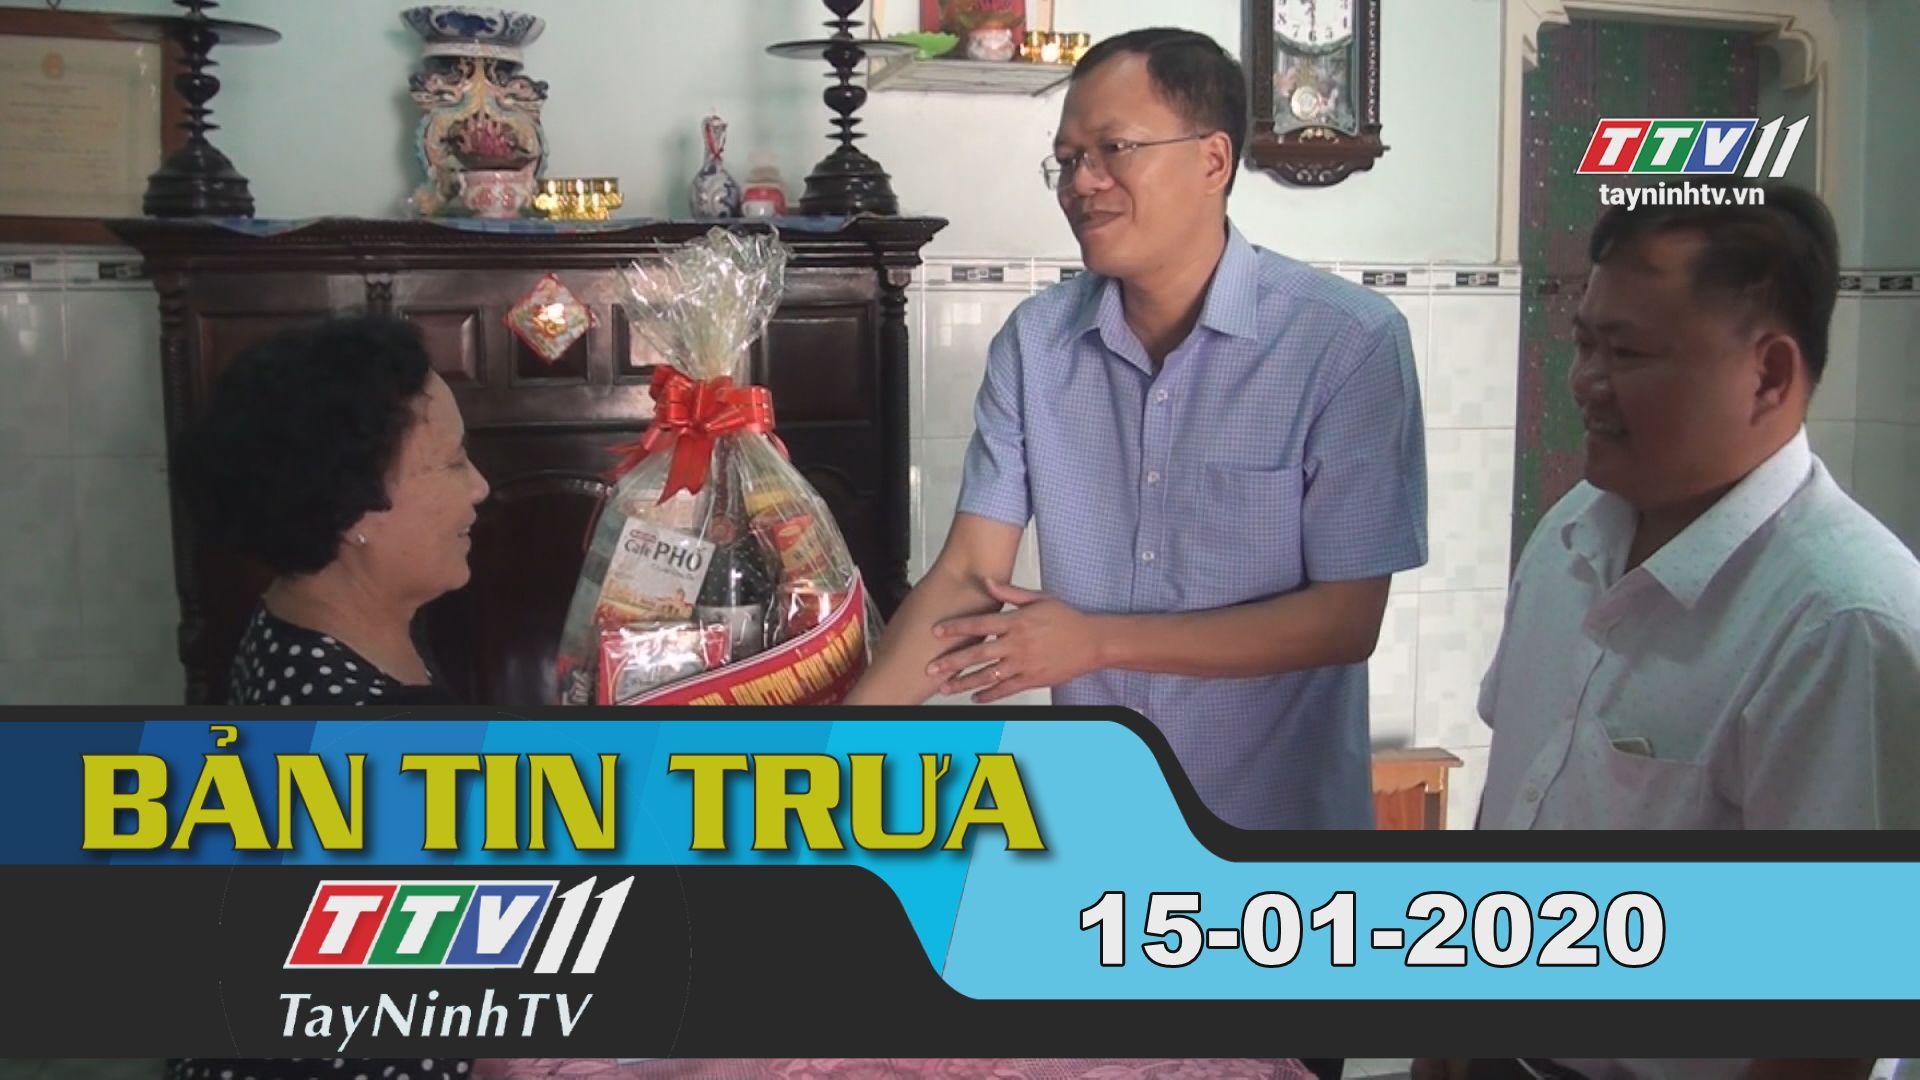 Bản tin trưa 15-01-2020 | Tin tức hôm nay | TayNinhTV